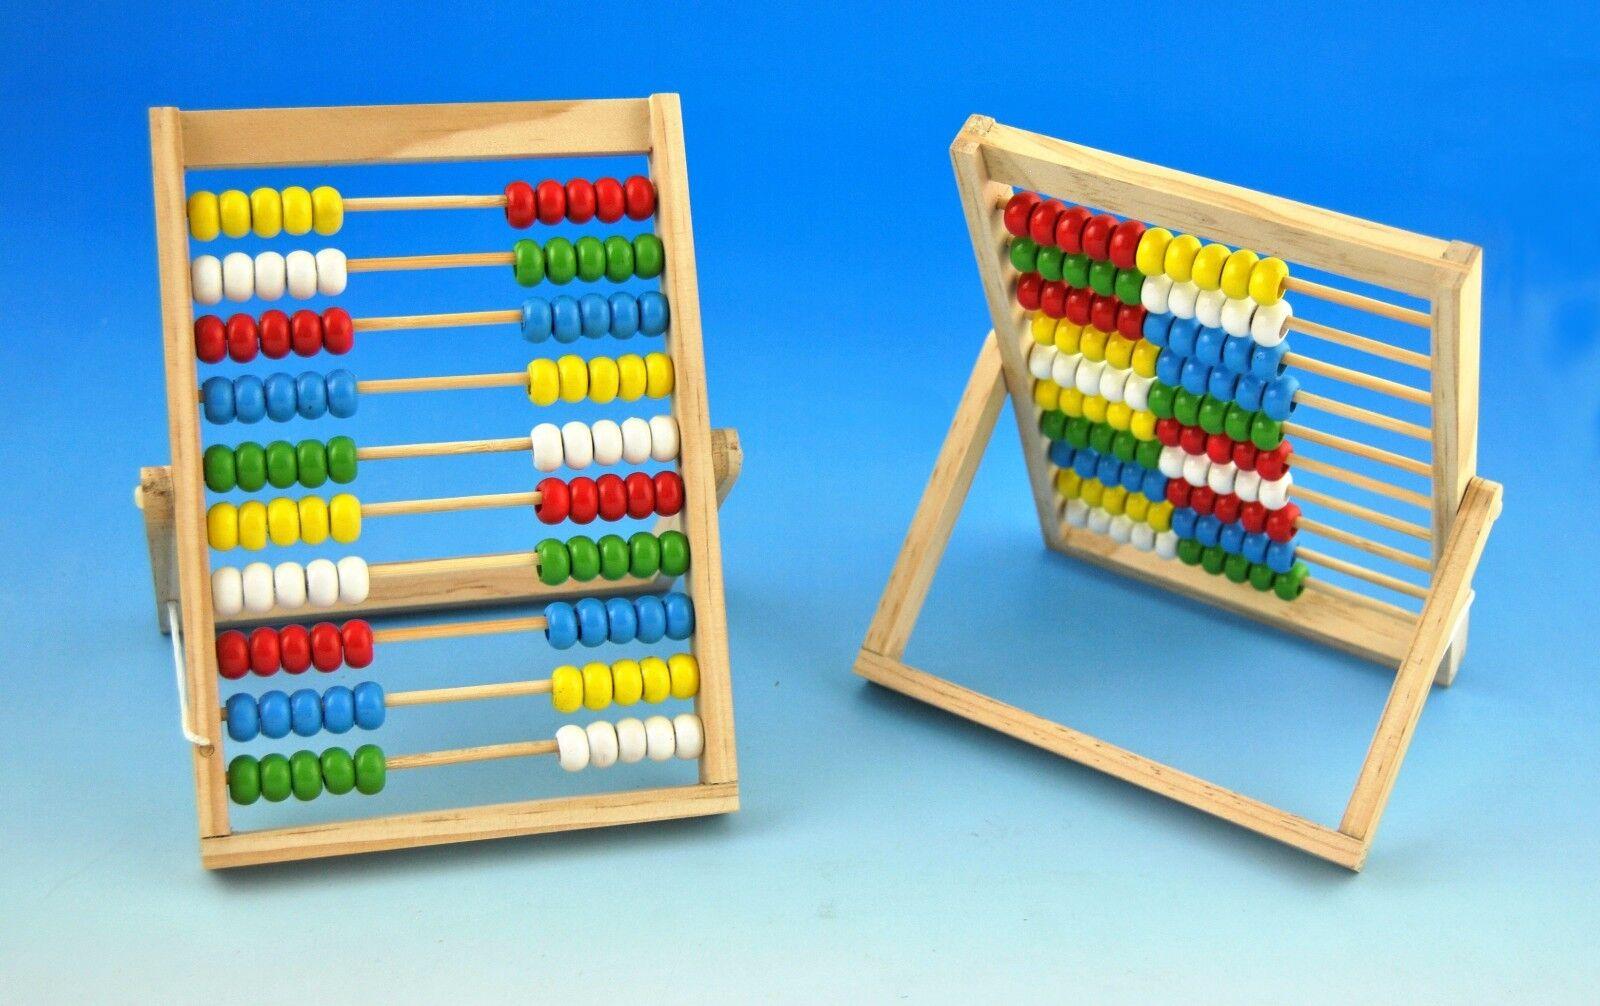 Rechenschieber Zählrahmen 100 Abacus Holzzählrahmen Rechenhilfe Abakus